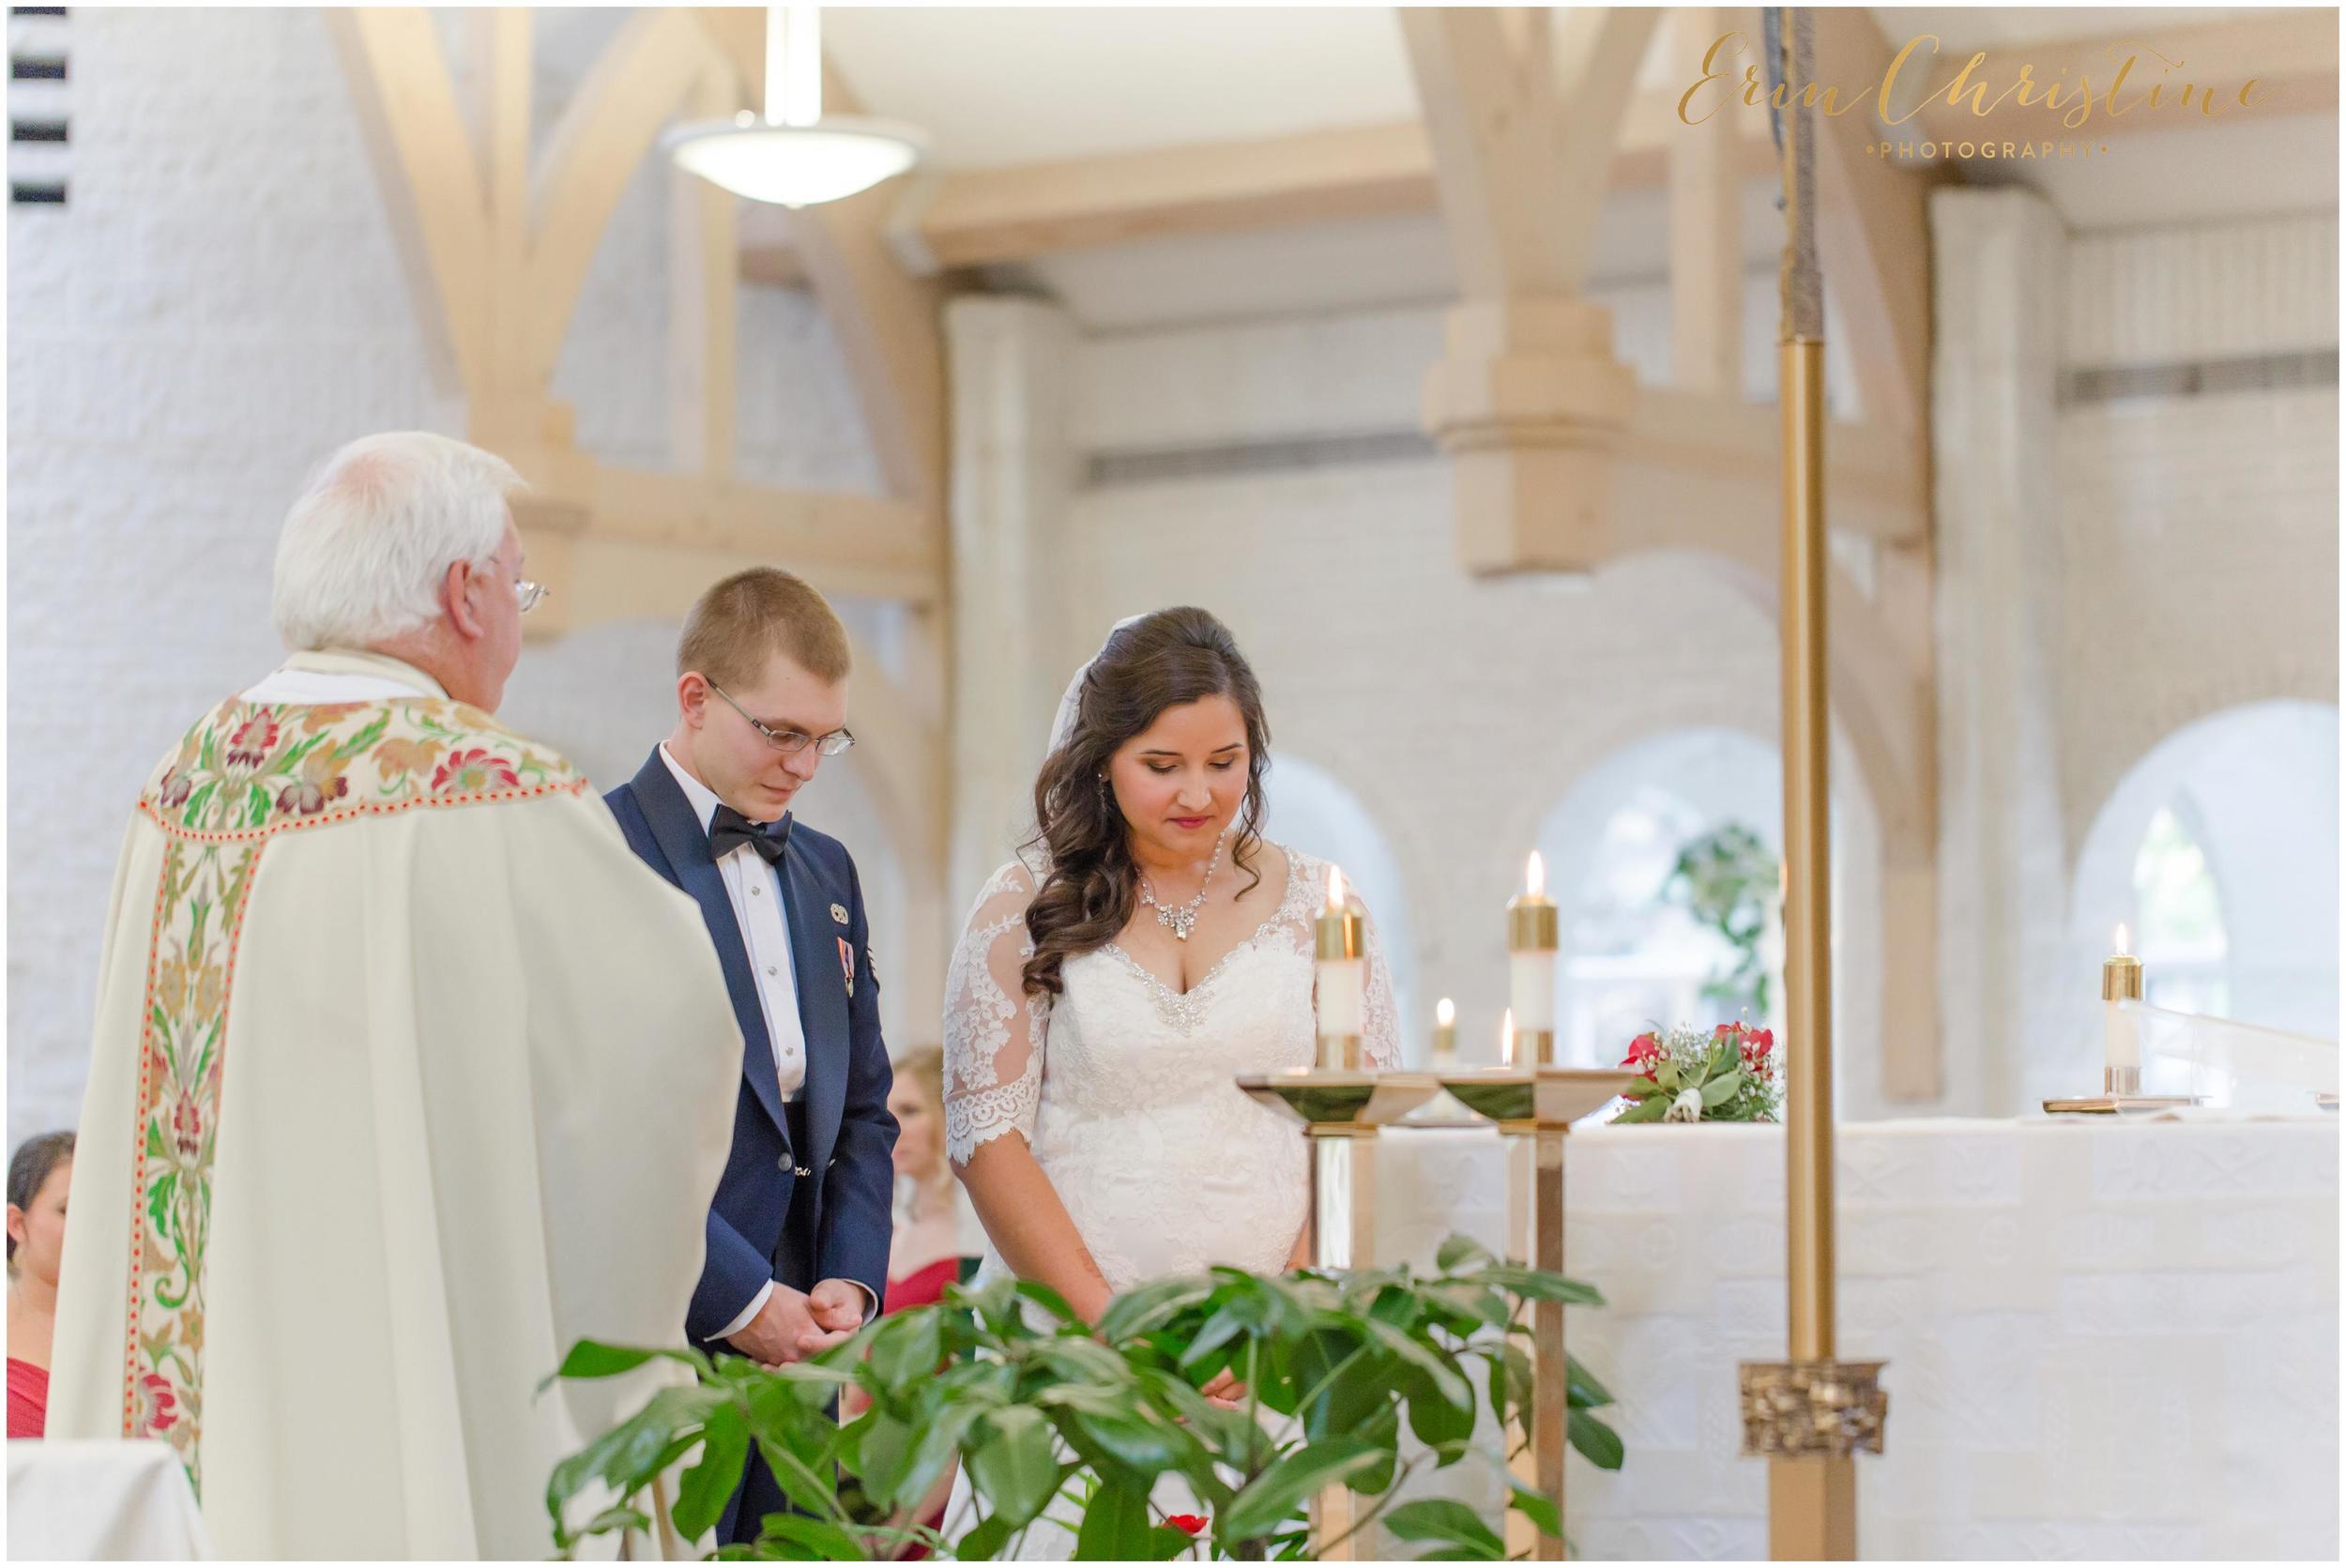 Catholic Ceremony Jesus The Good Shephered-9050.jpg